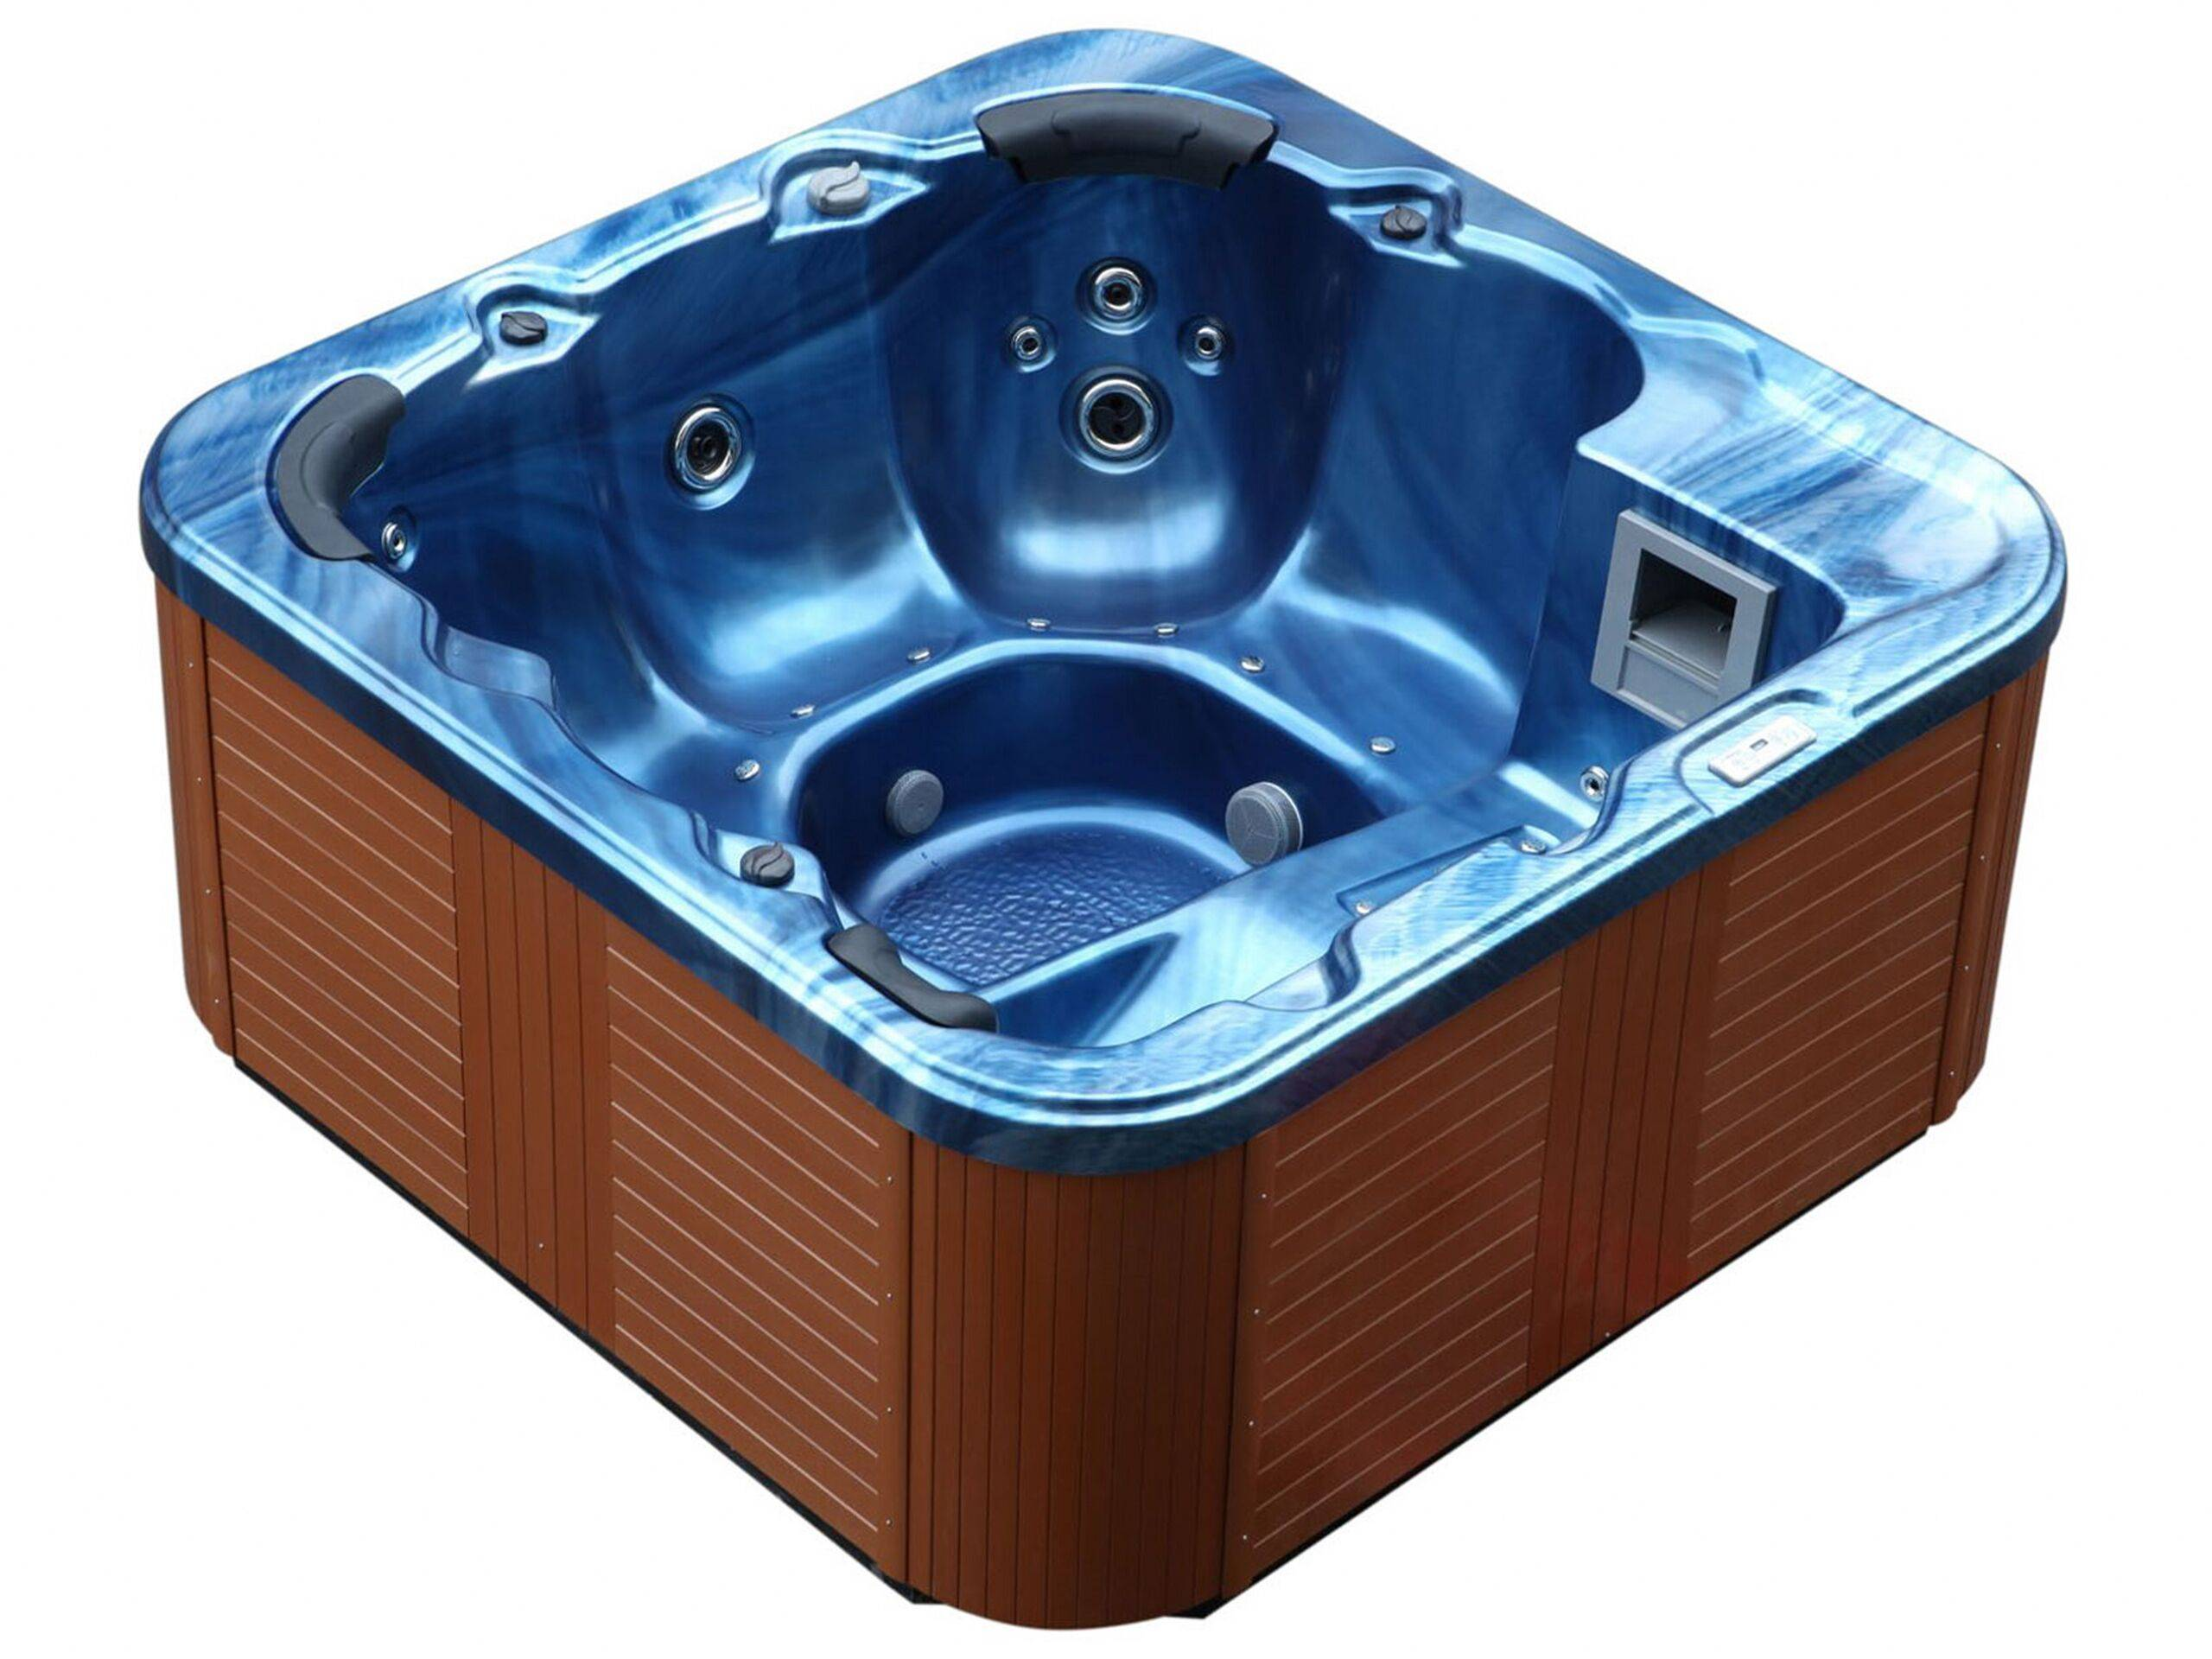 beliani vasca idromassaggio da esterno riscaldata blu